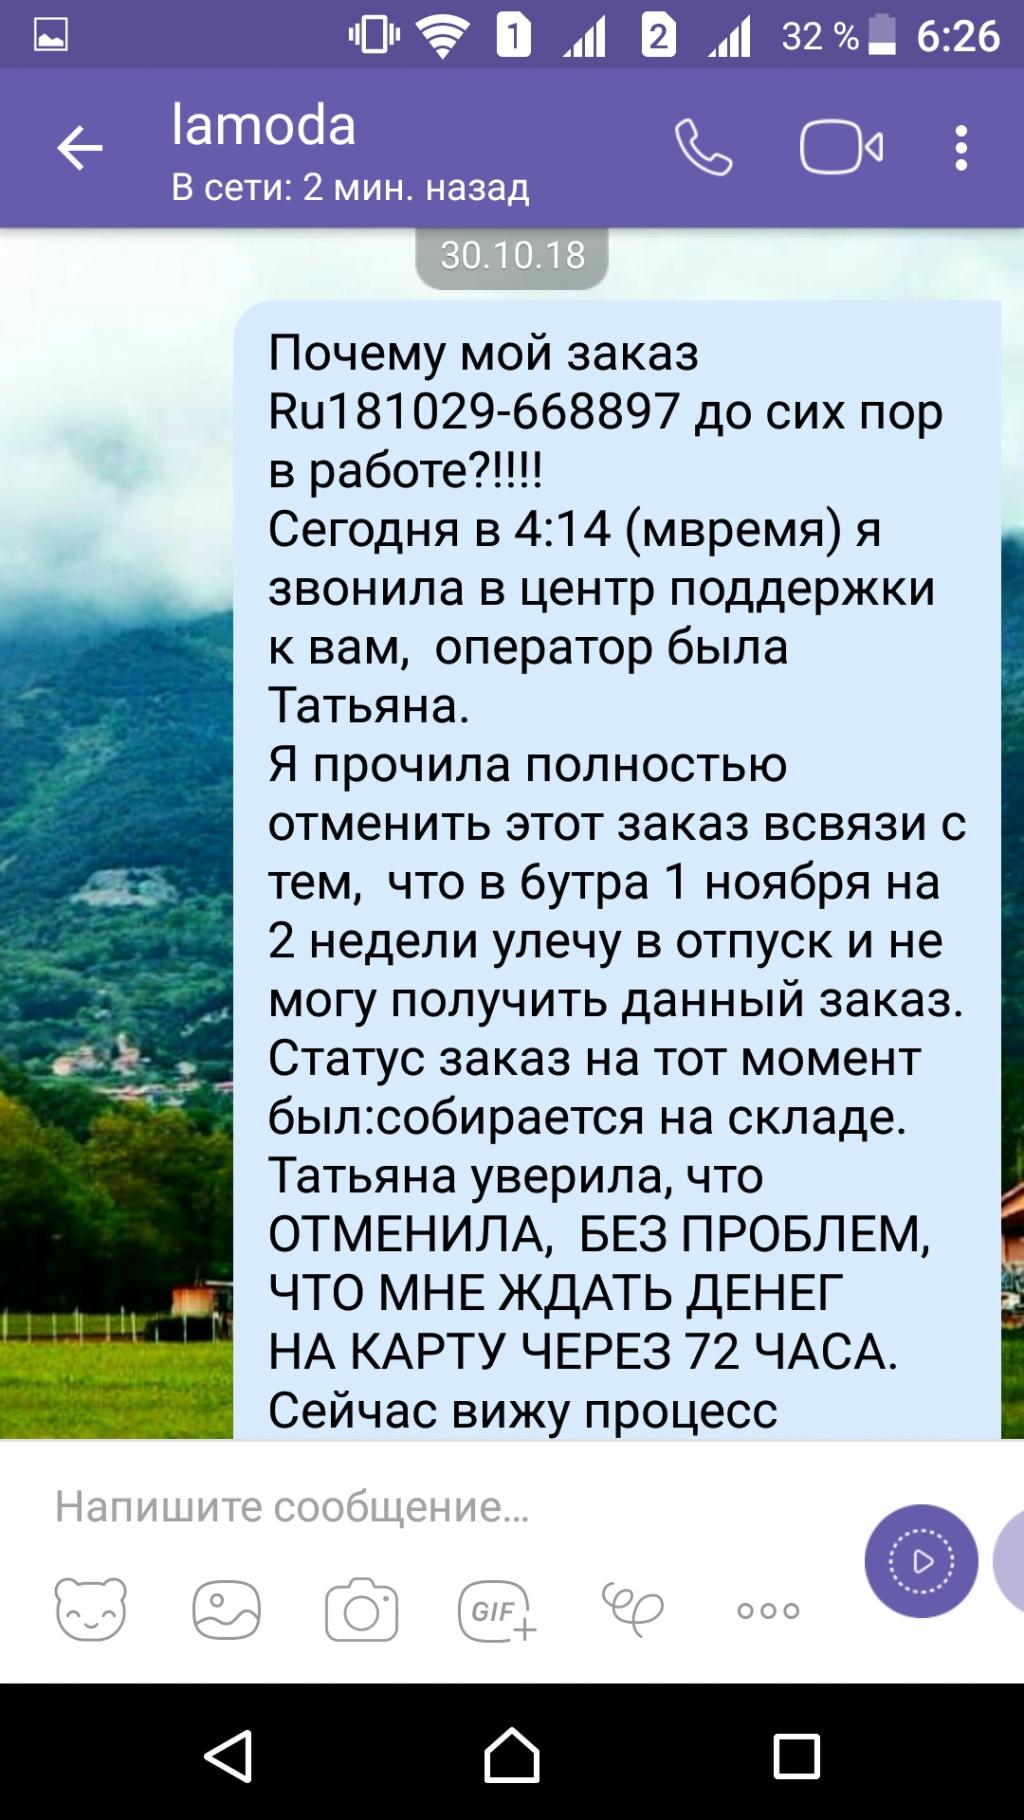 lamoda.ru - Фирма Lamoda меня обманула! Схема обмана